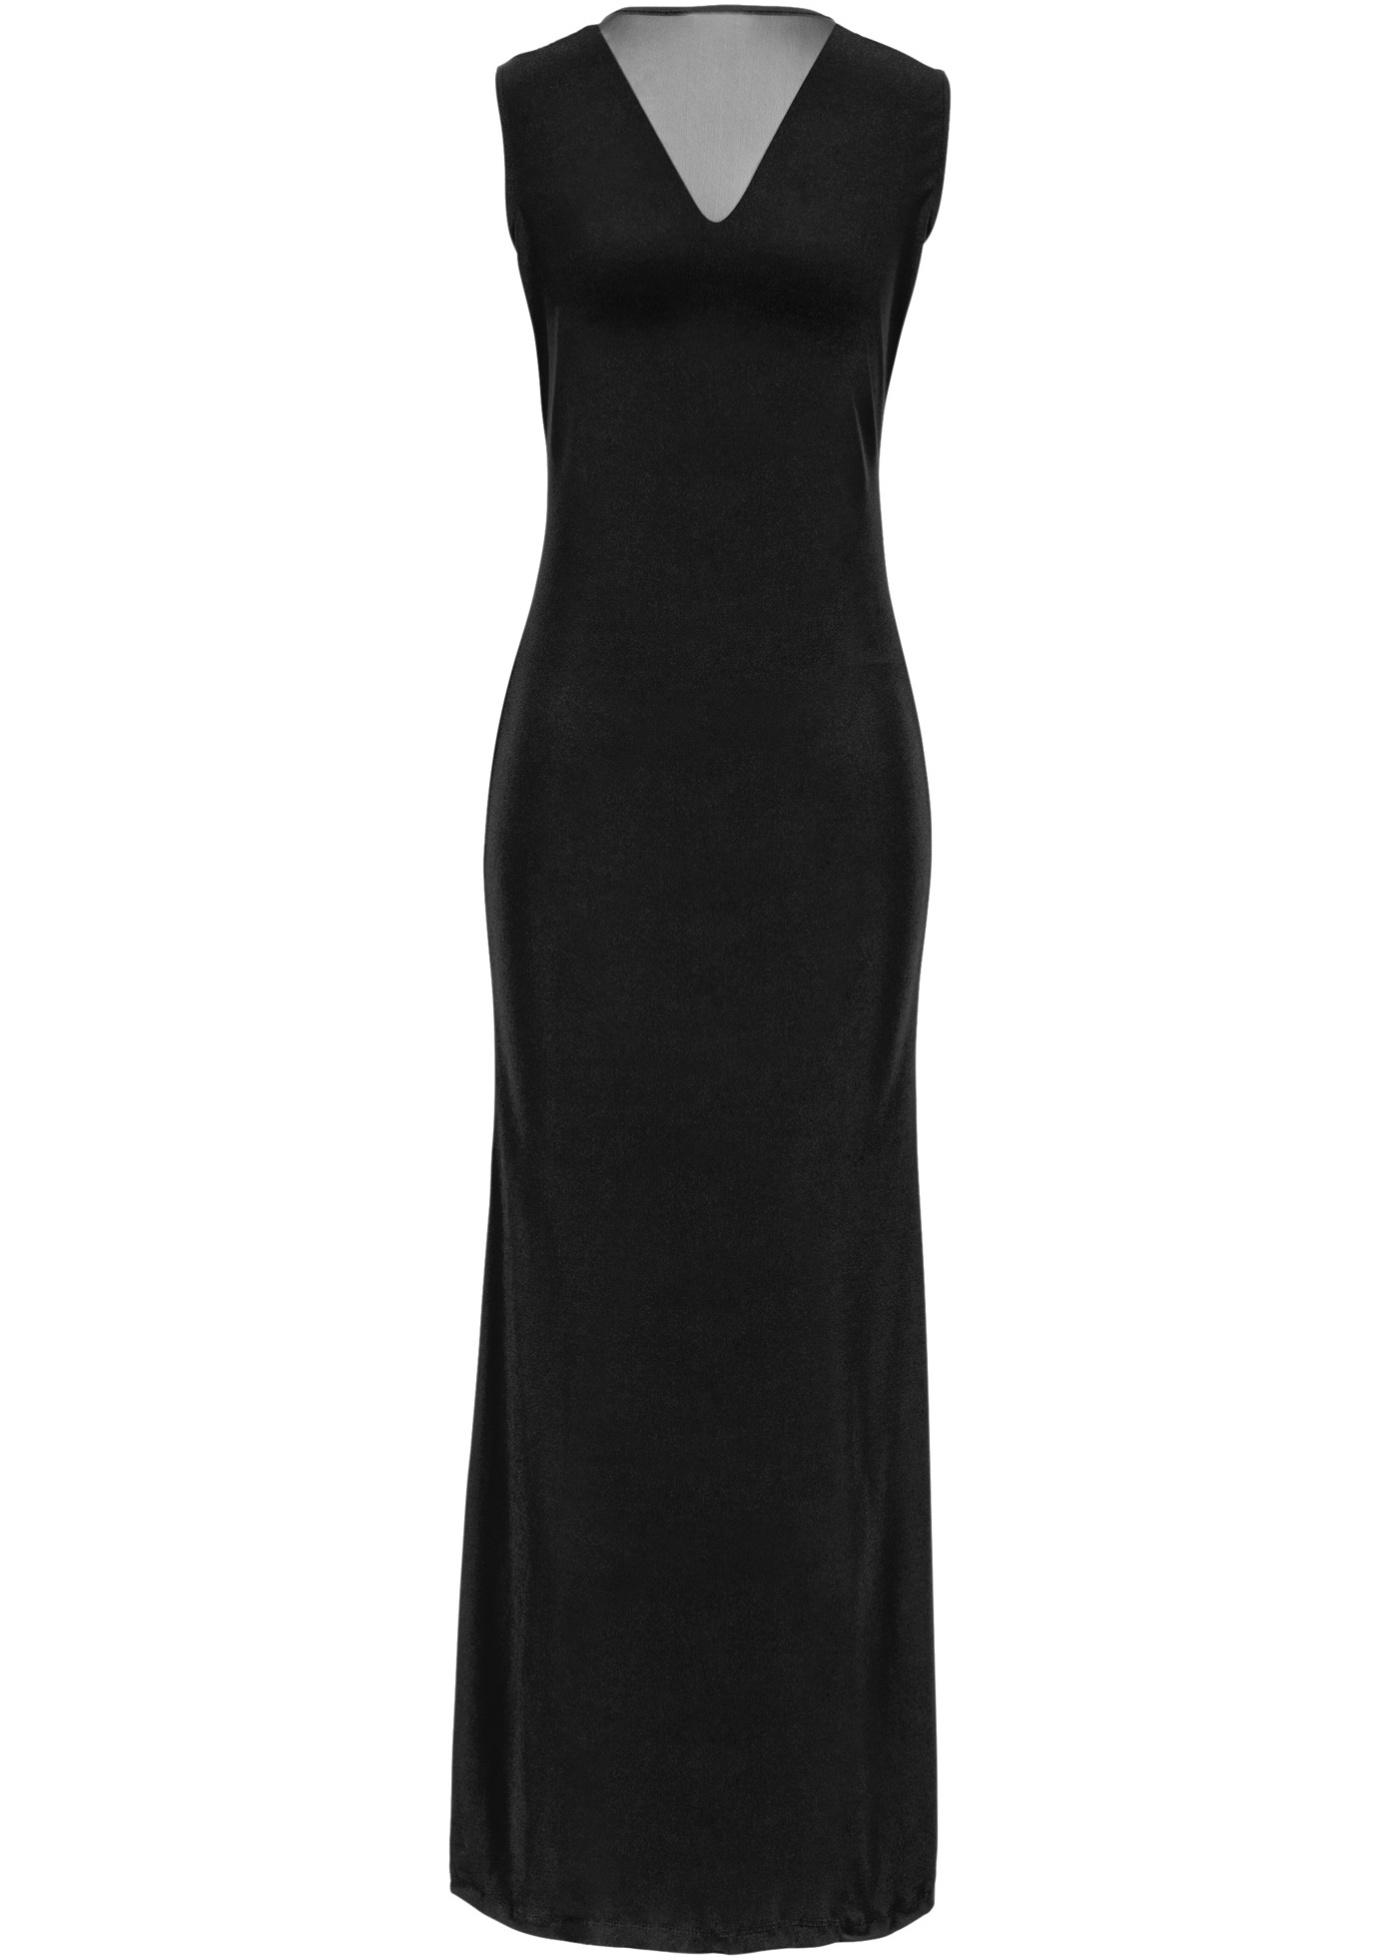 Robe de soirée noir femme - bonprix